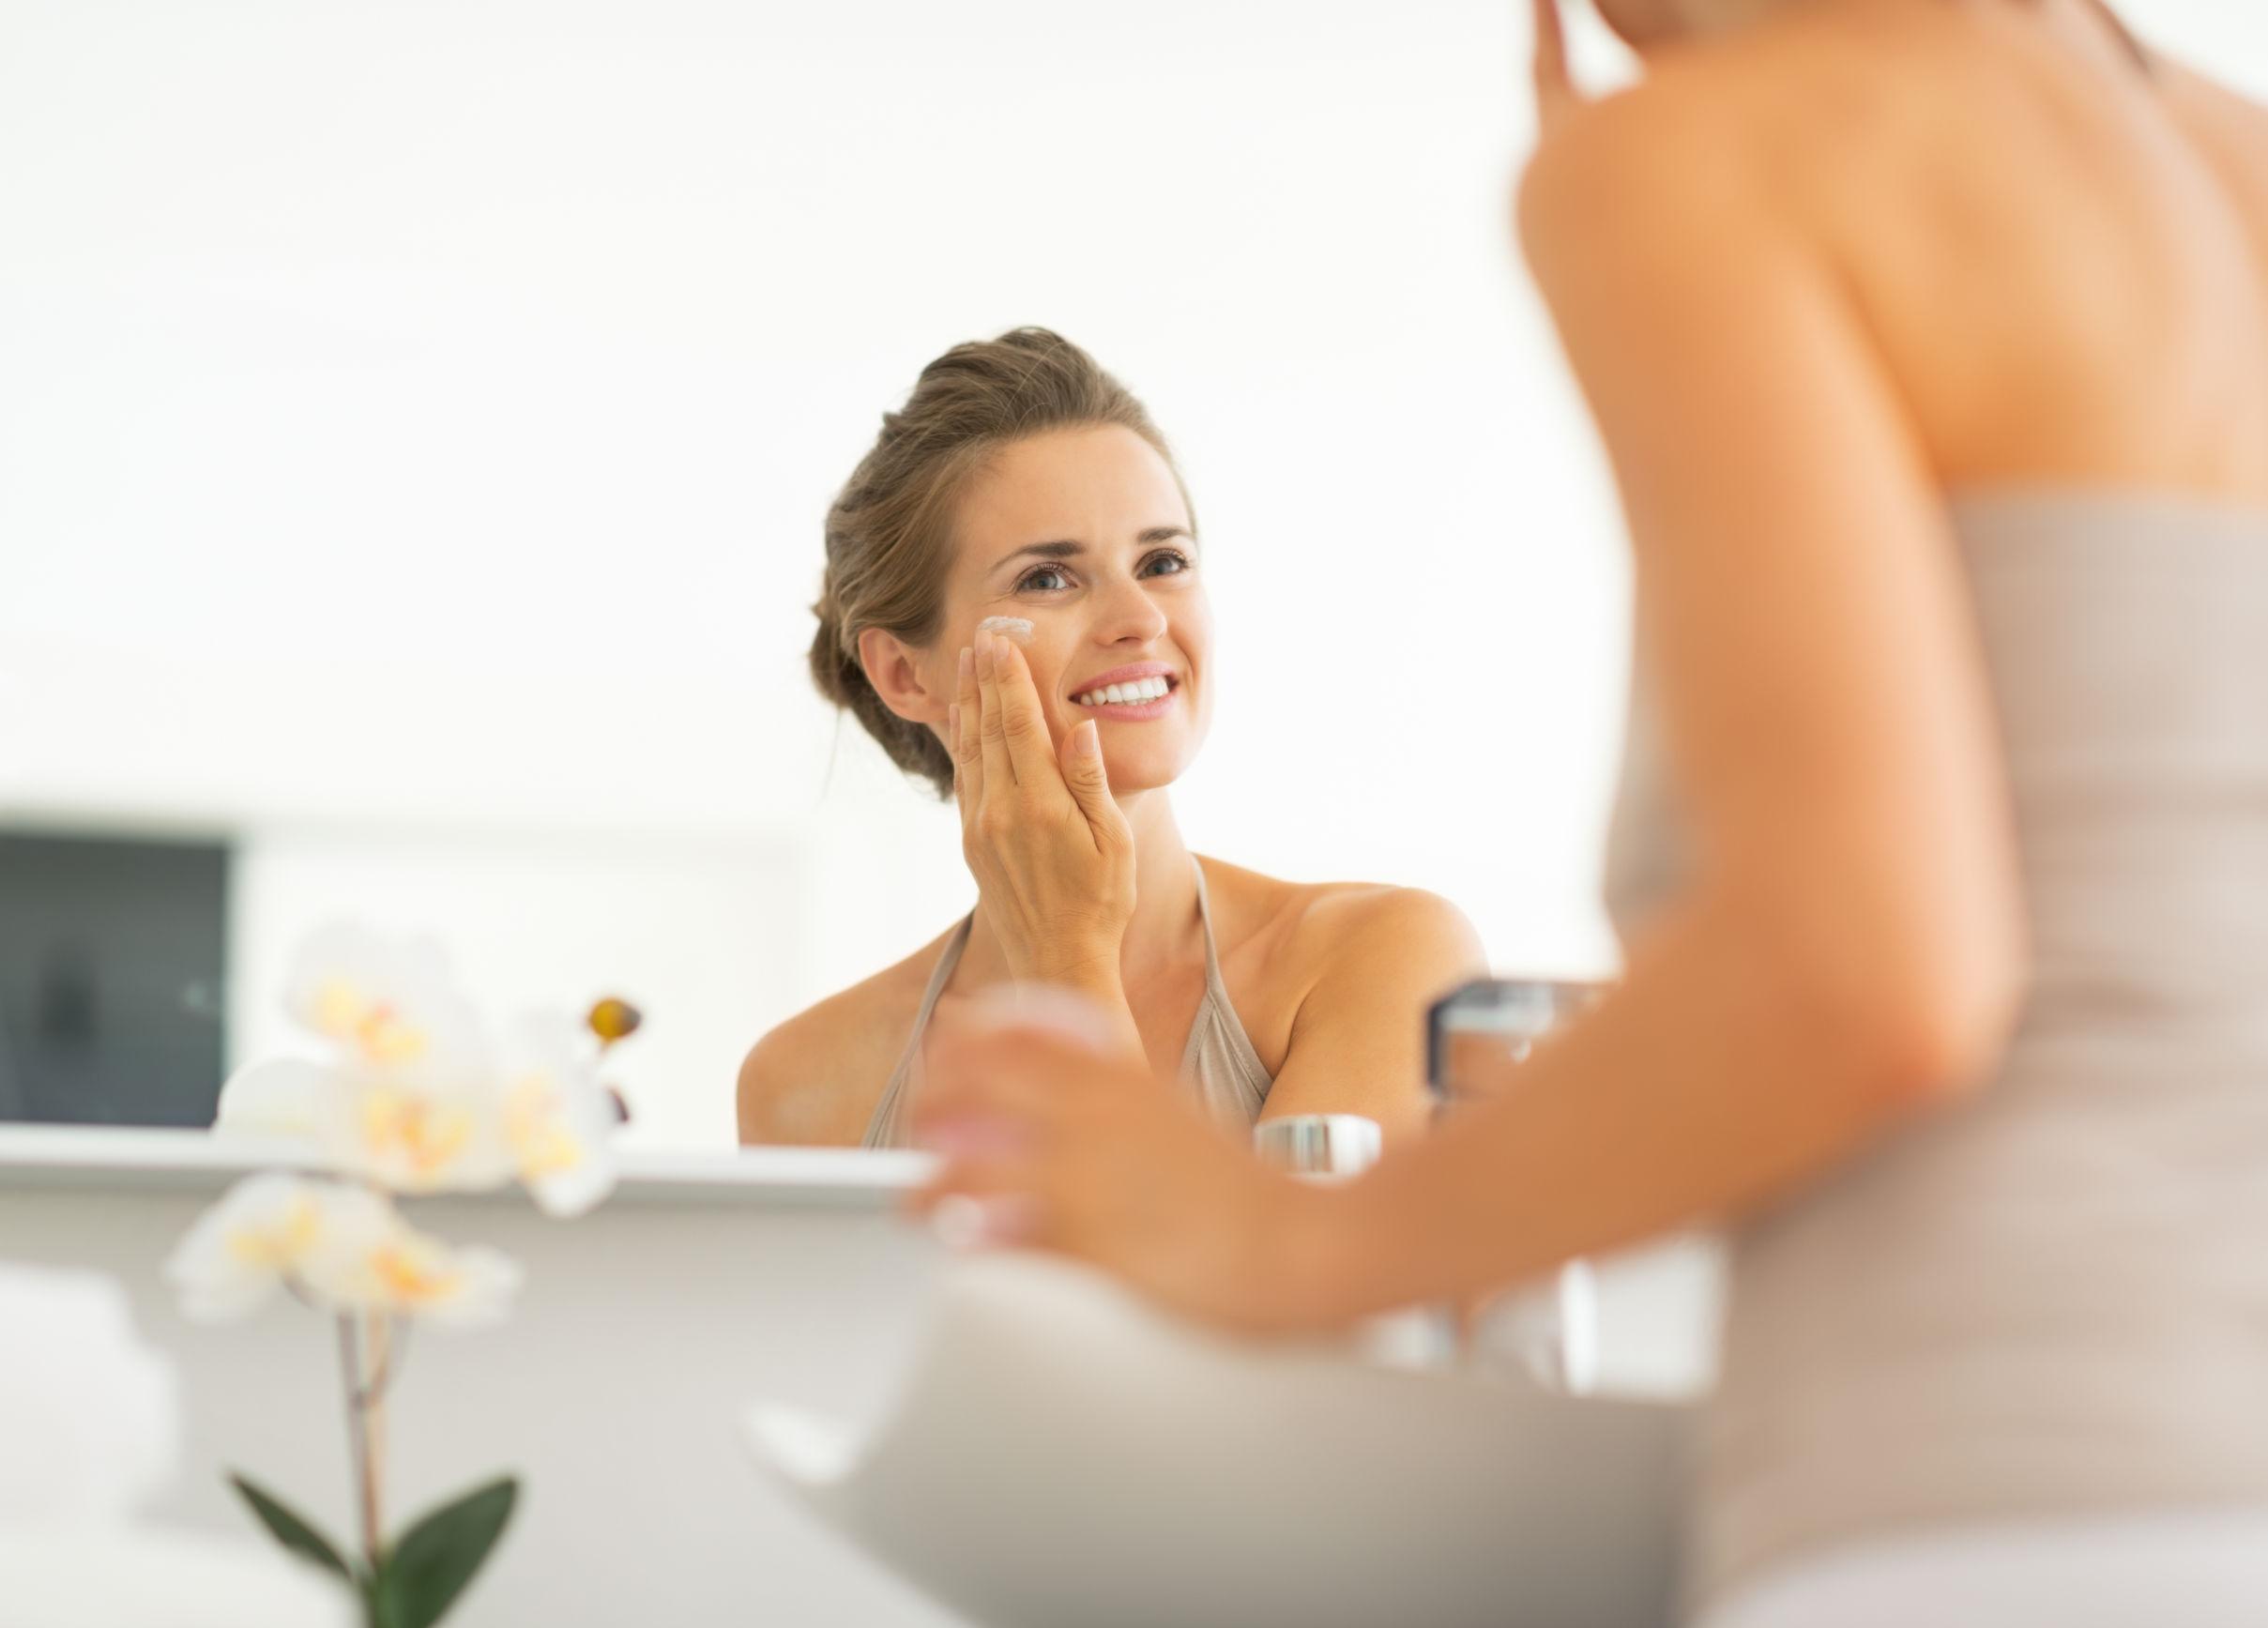 29004541 - happy young woman applying cream in bathroom